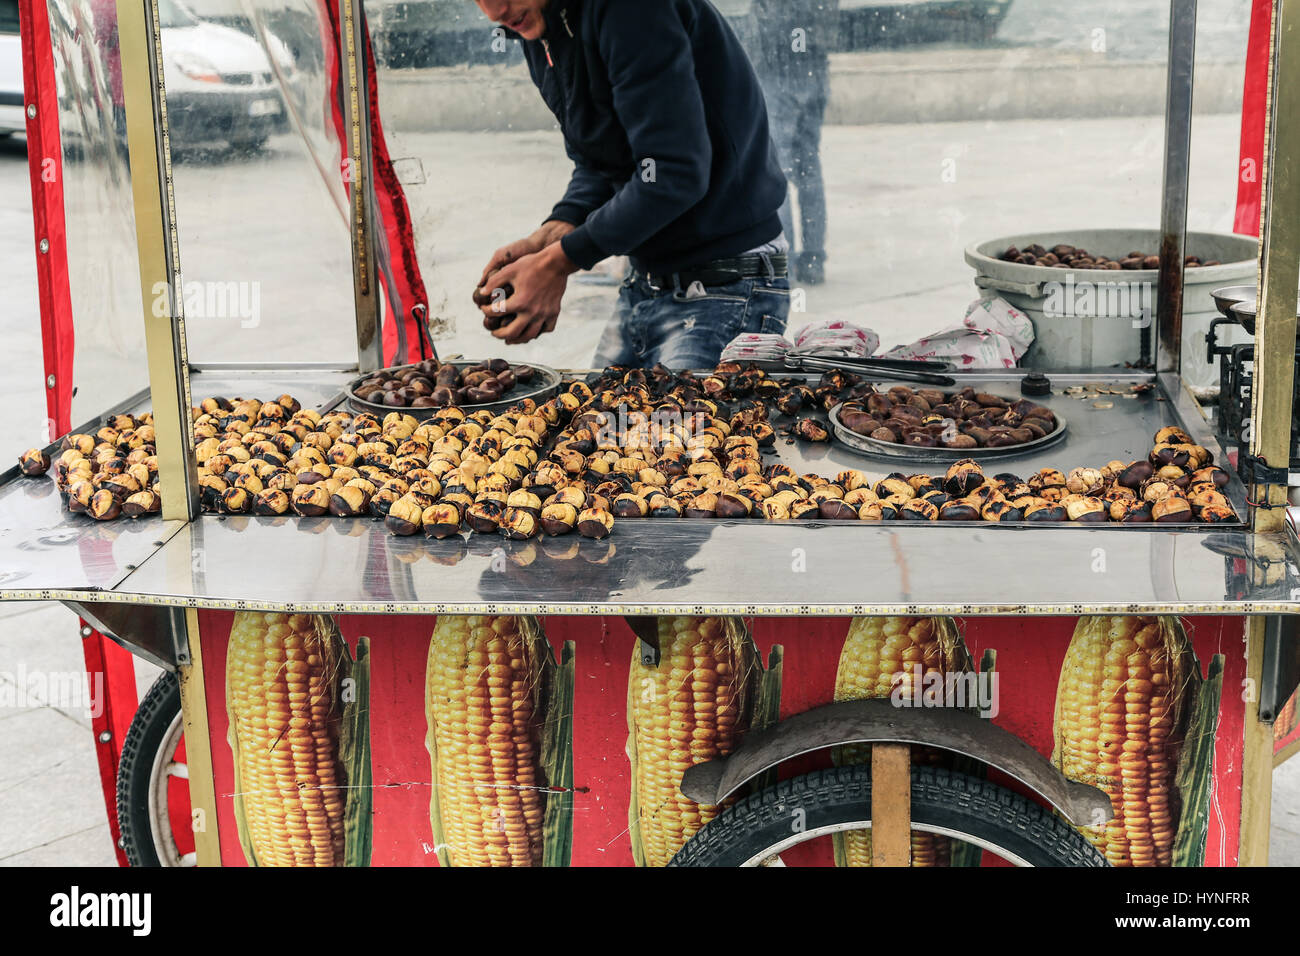 Roasted chestnut seller in Istanbul, Turkey - Stock Image